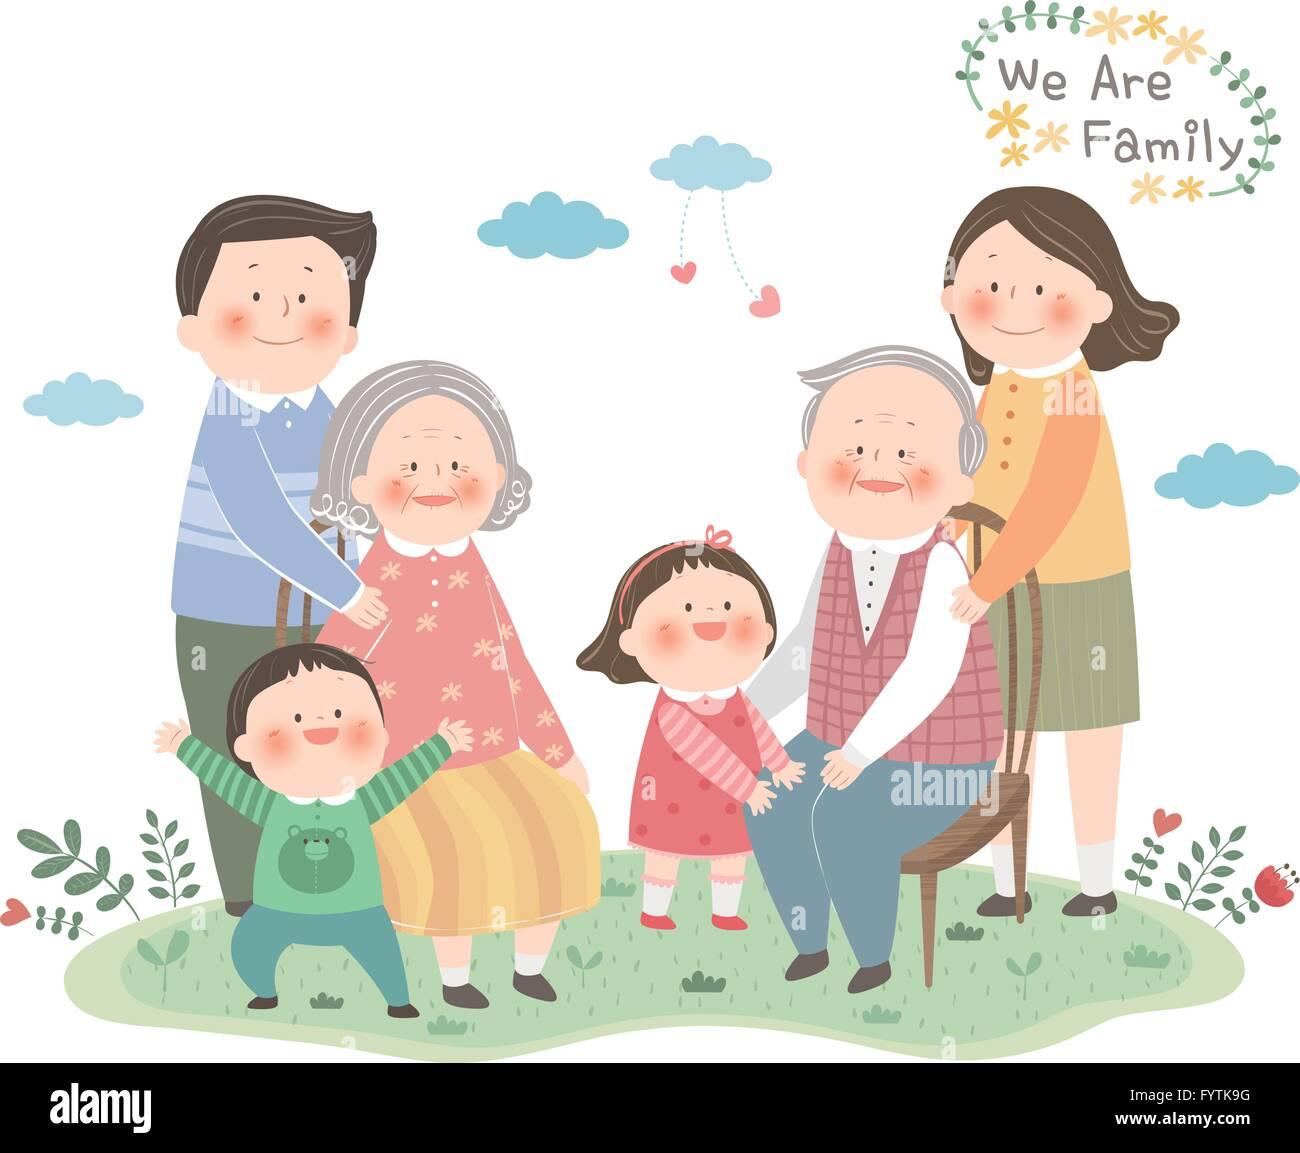 Family members 010 - Stock Image